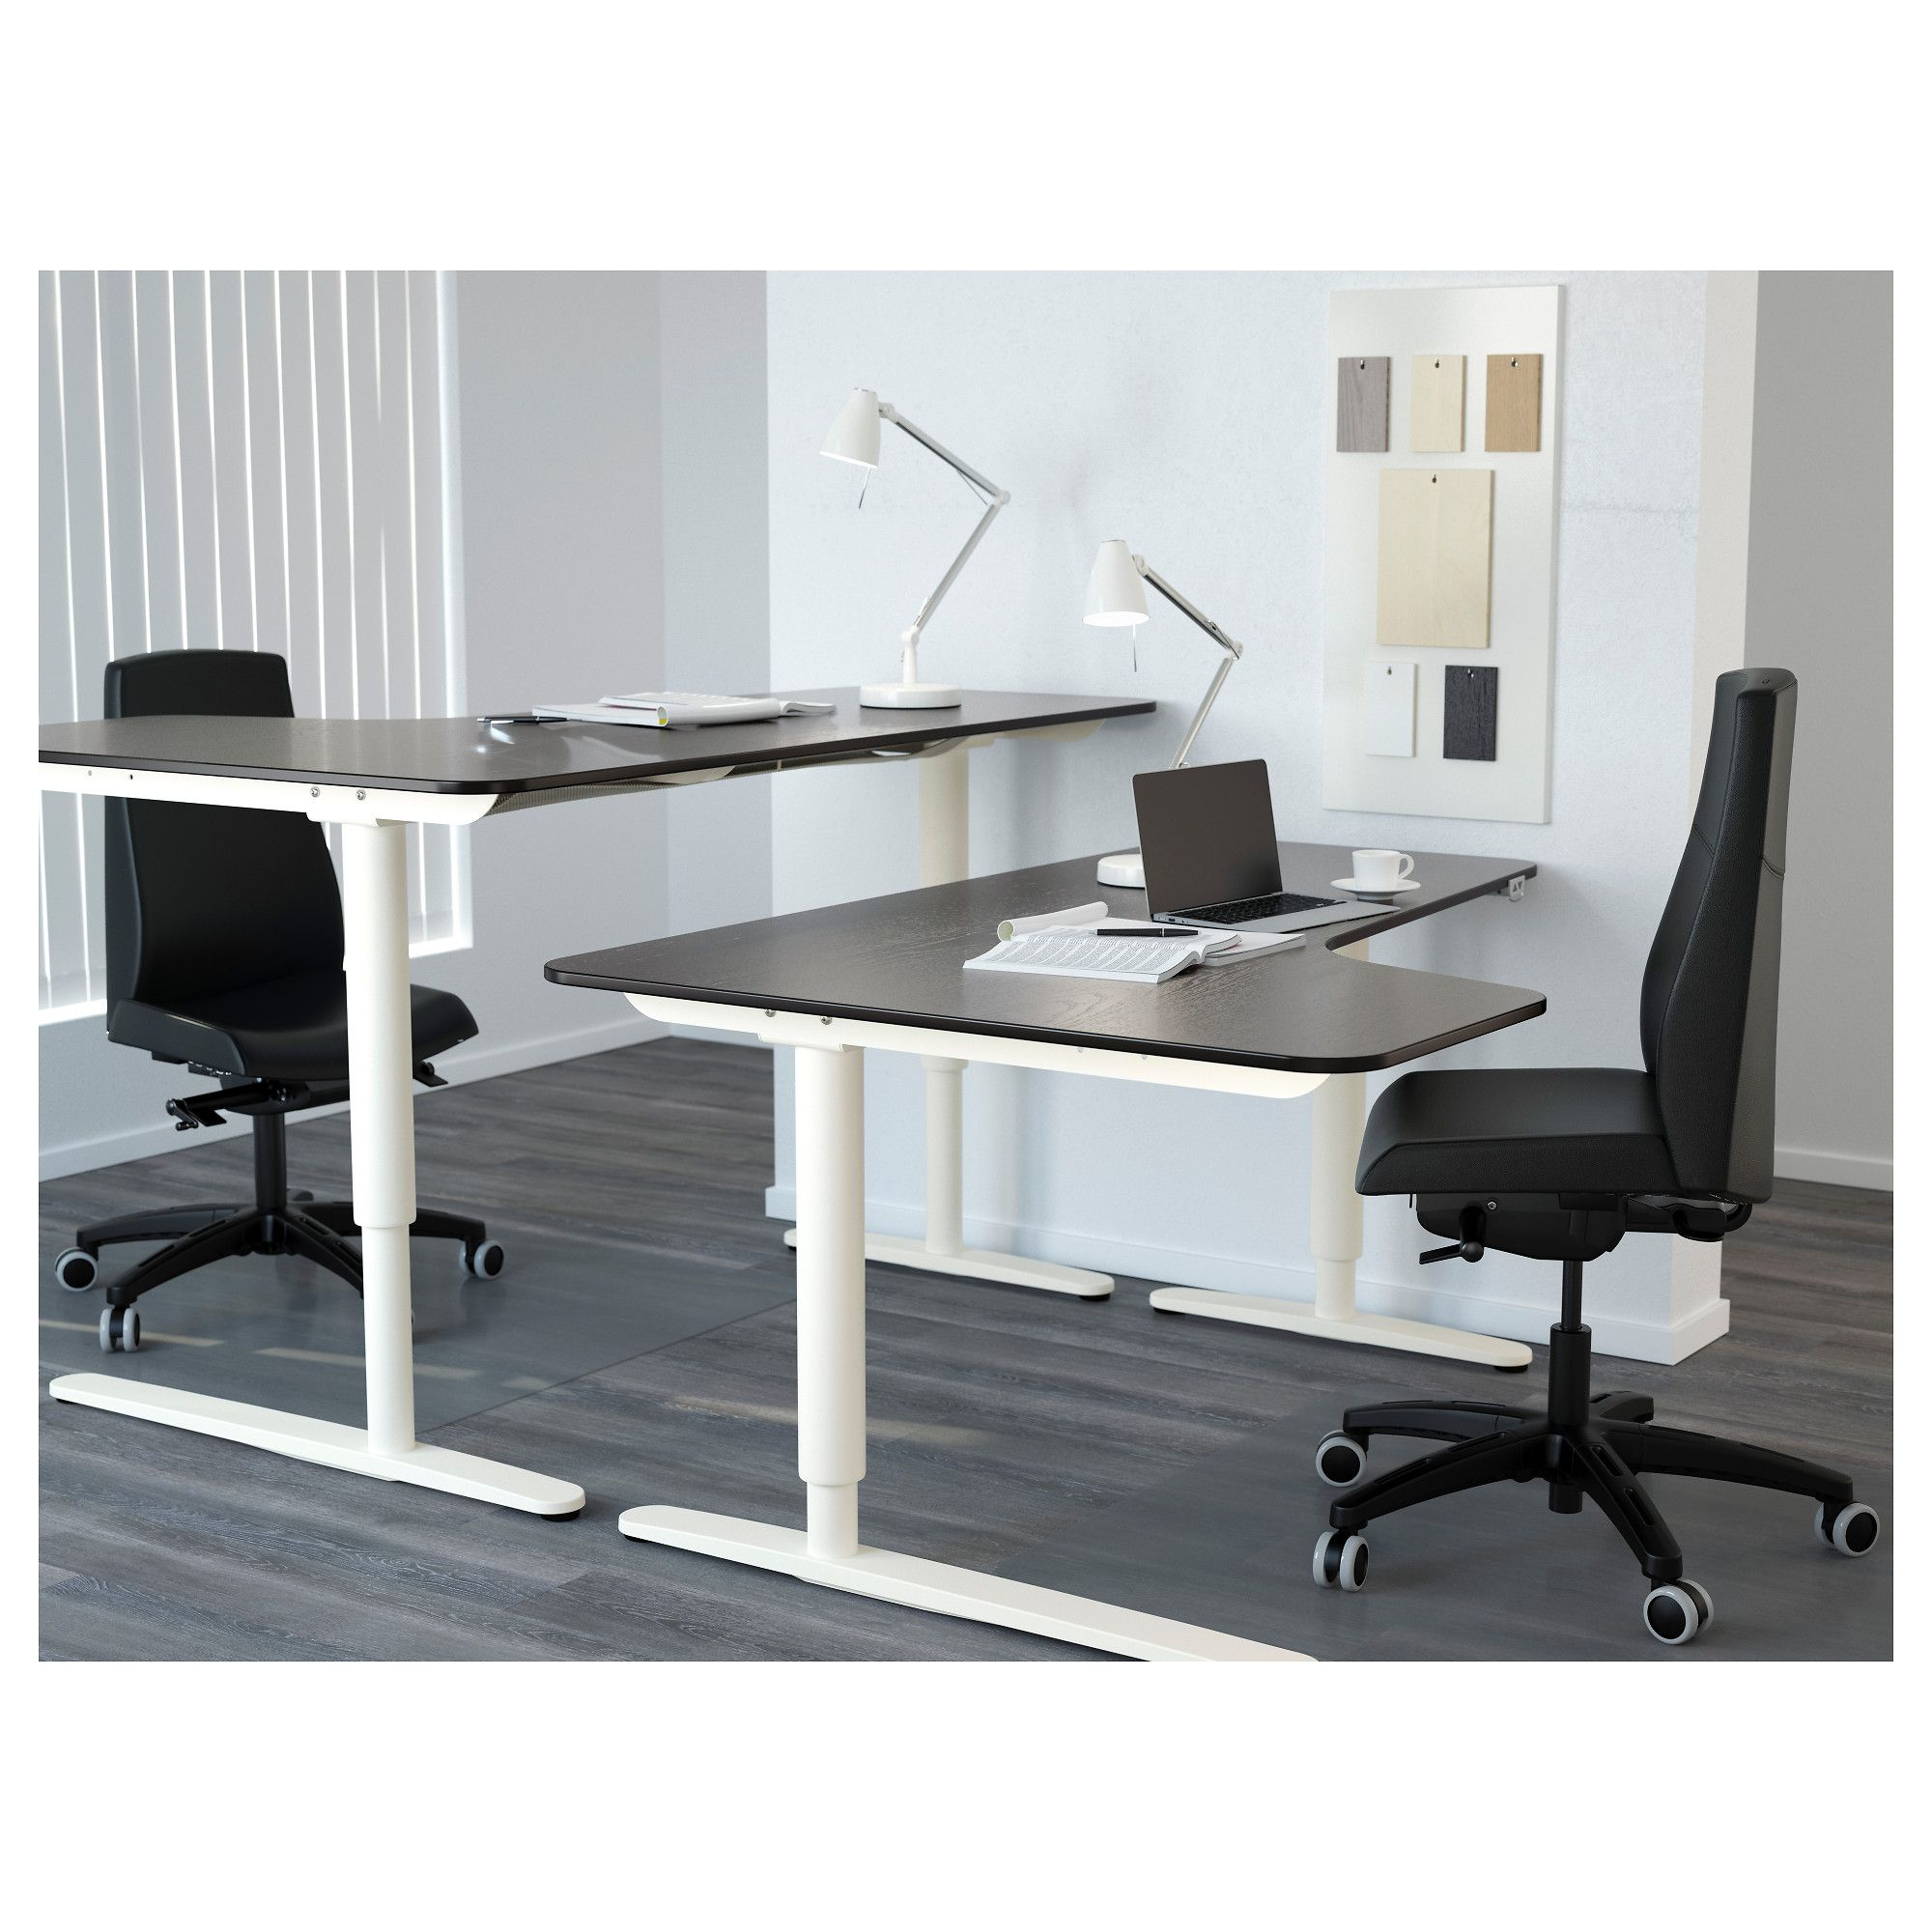 Ikea  Bekant Corner Desk Left Sitstand Black Brown, White